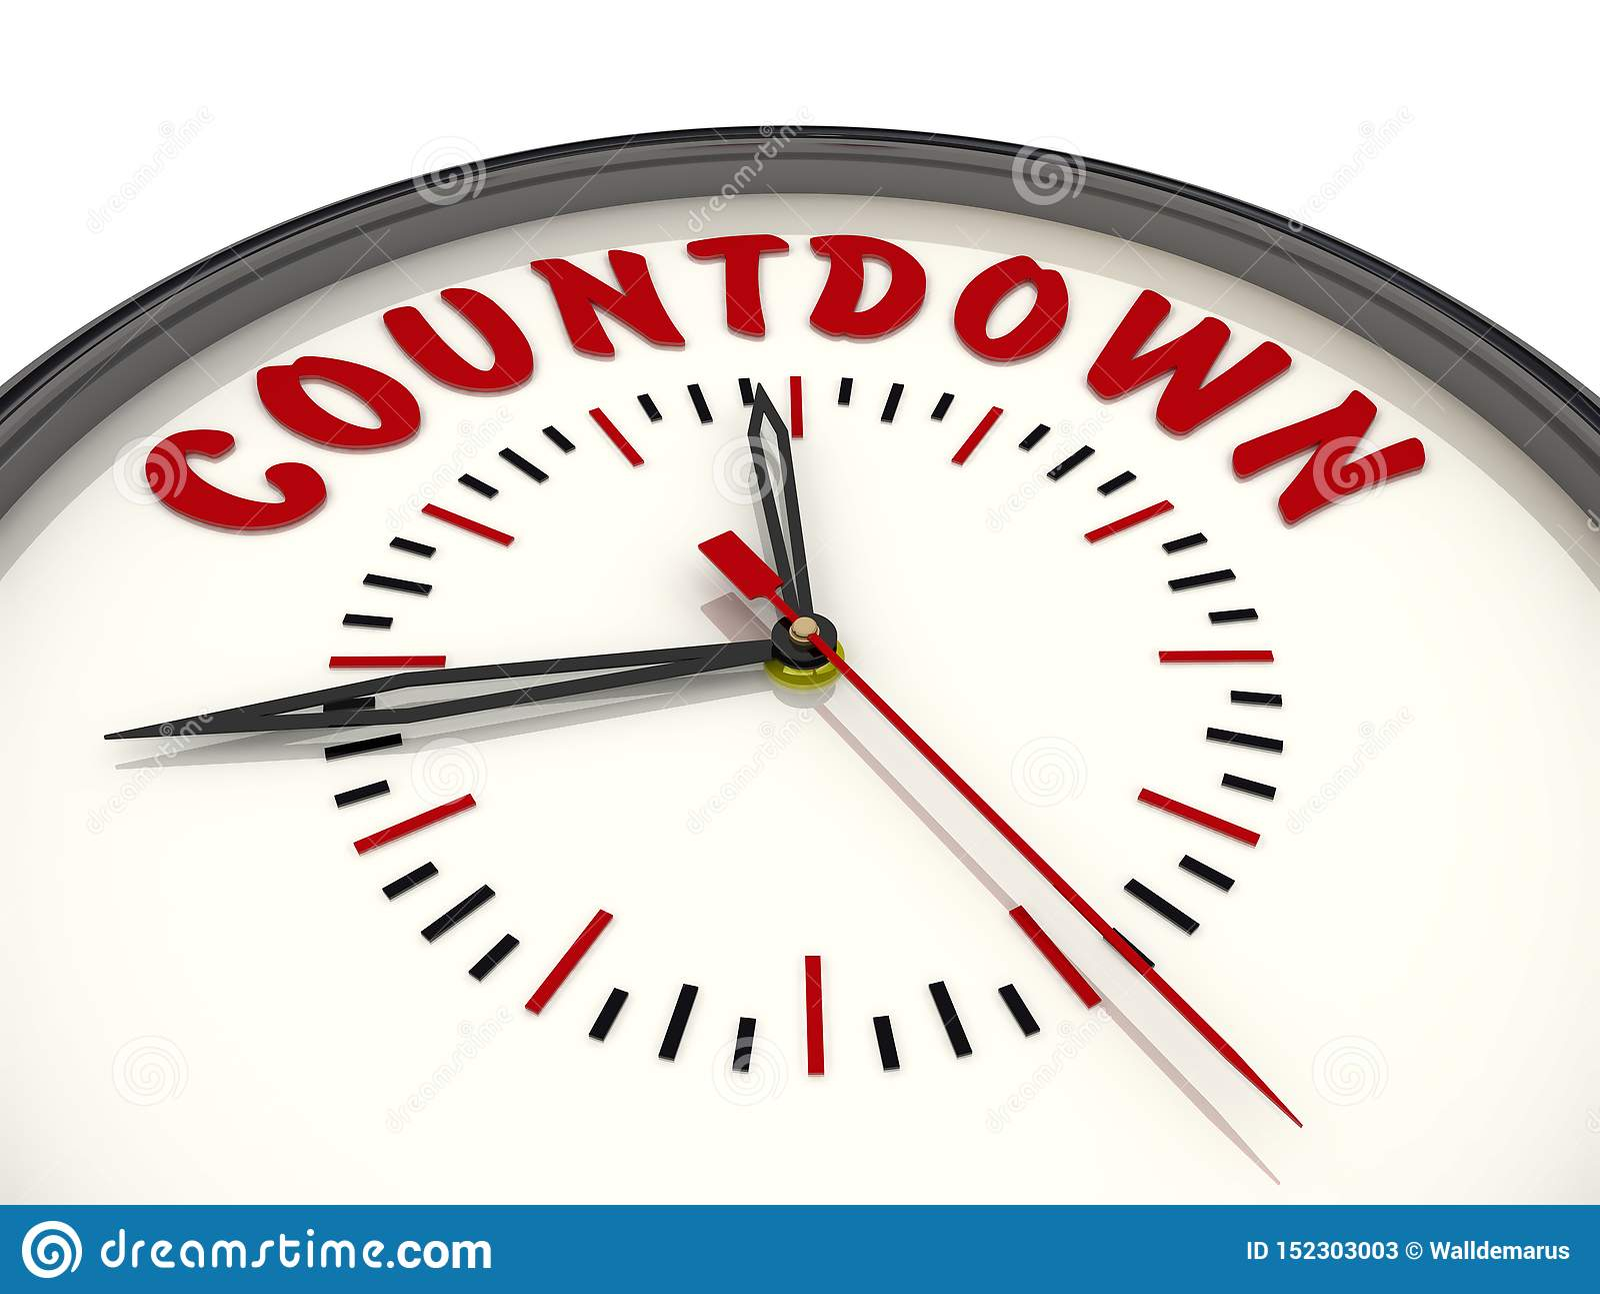 Countdown Reloj con el texto